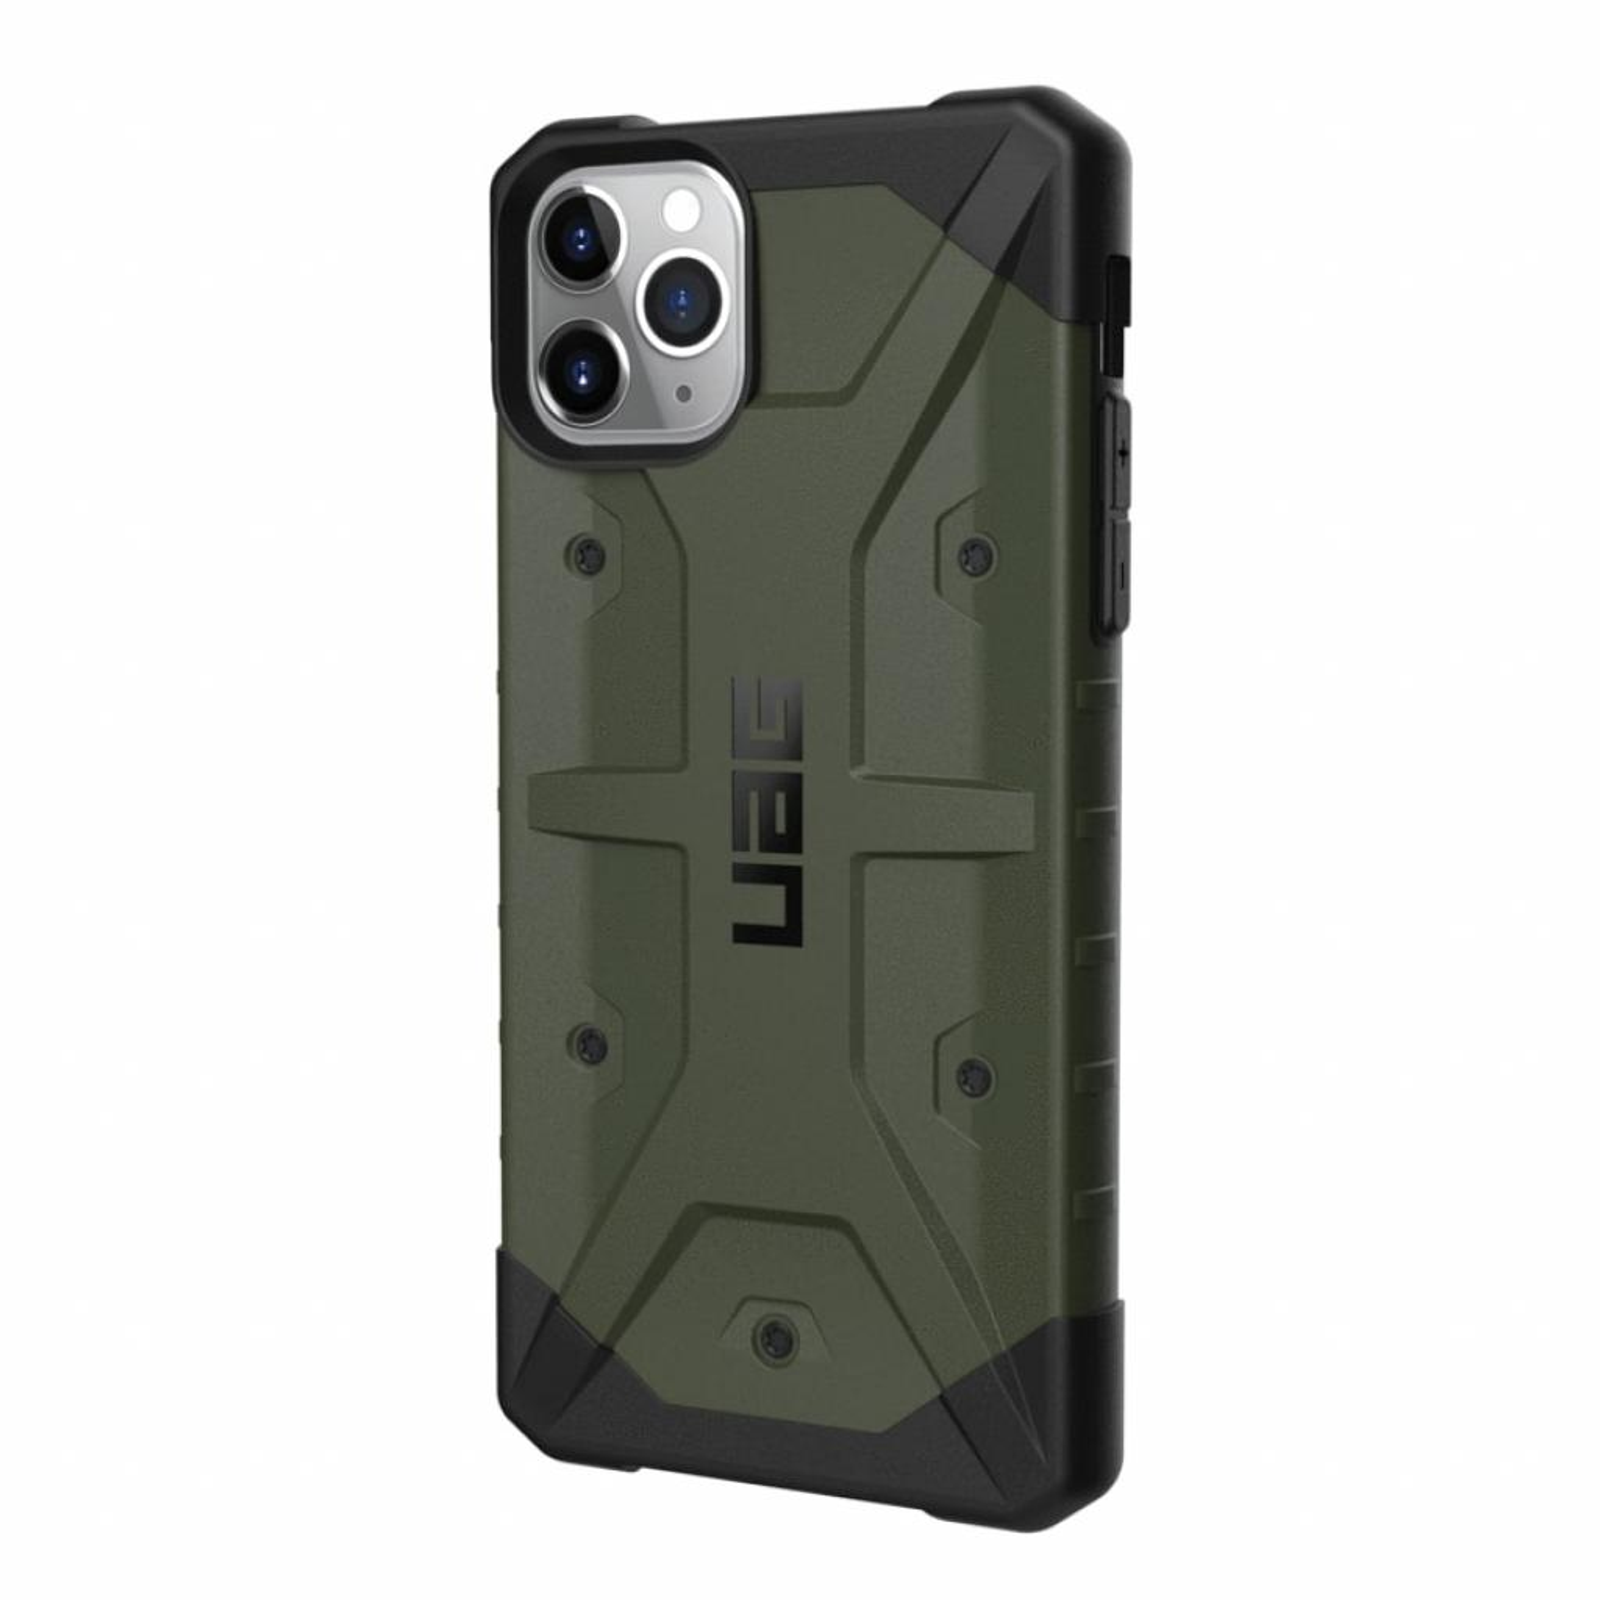 Чехол для моб. телефона Uag iPhone 11 Pro Max Pathfinder, Slate (111727115454) изображение 5